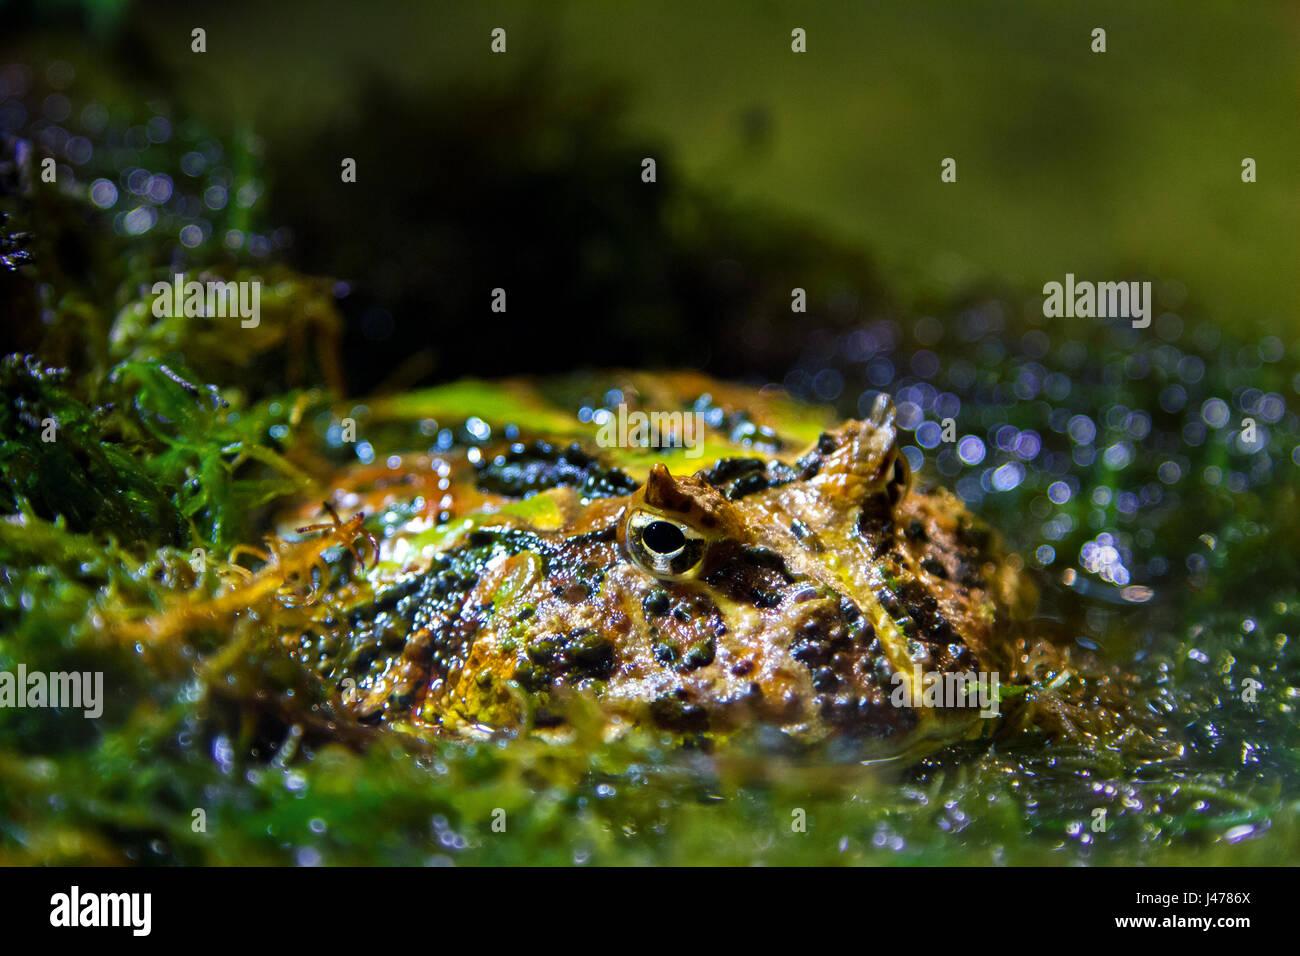 a Image exotic amphibians Brazilian horned toadf - Stock Image